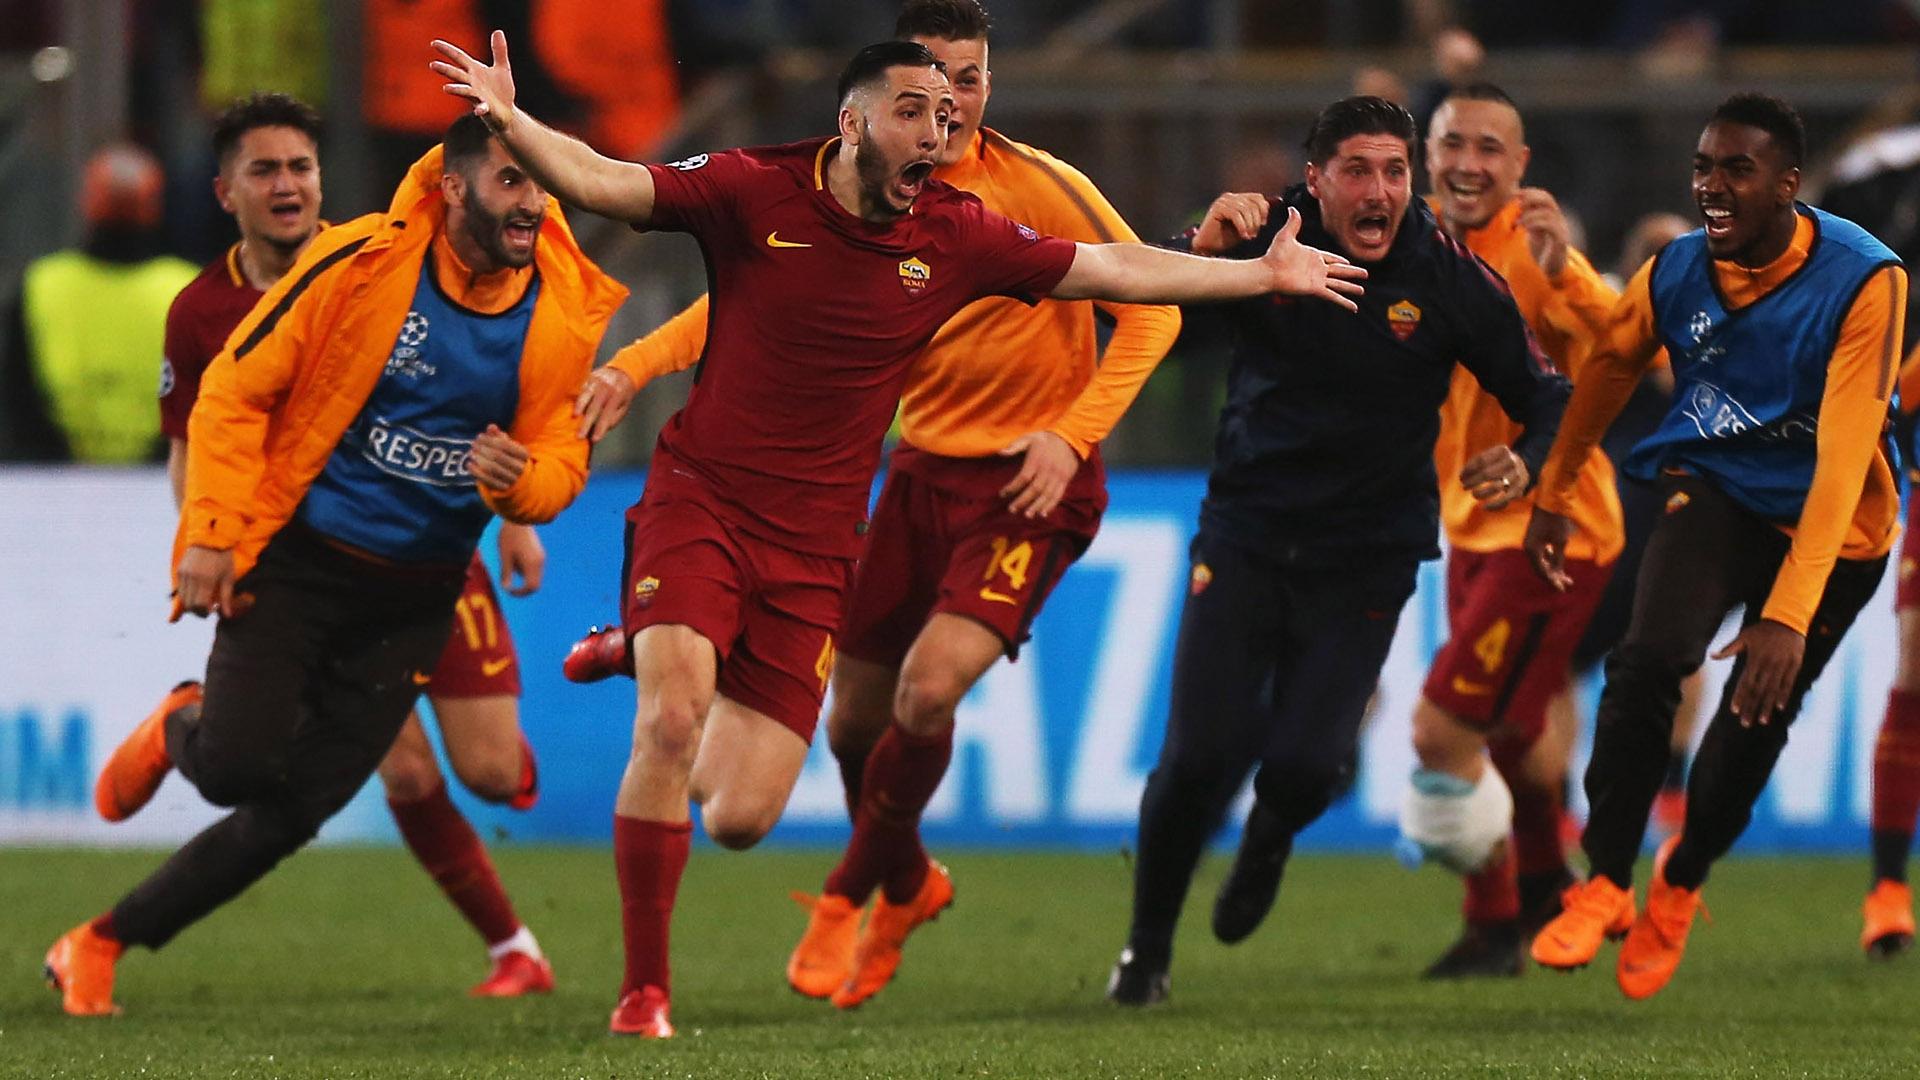 VIDEO: Roma stun Barca 3-0 to progress in UCL